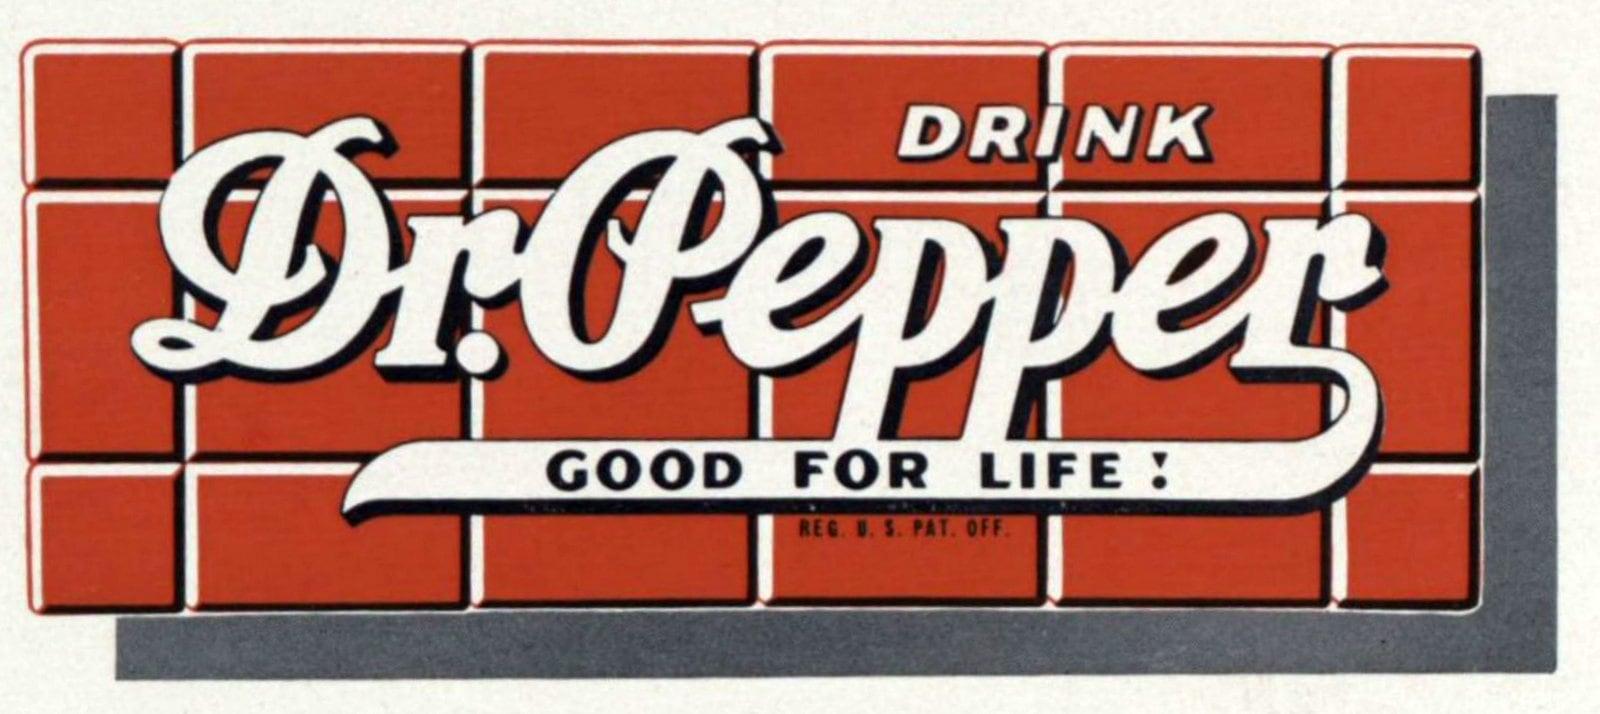 Vintage Dr Pepper sign from 1949